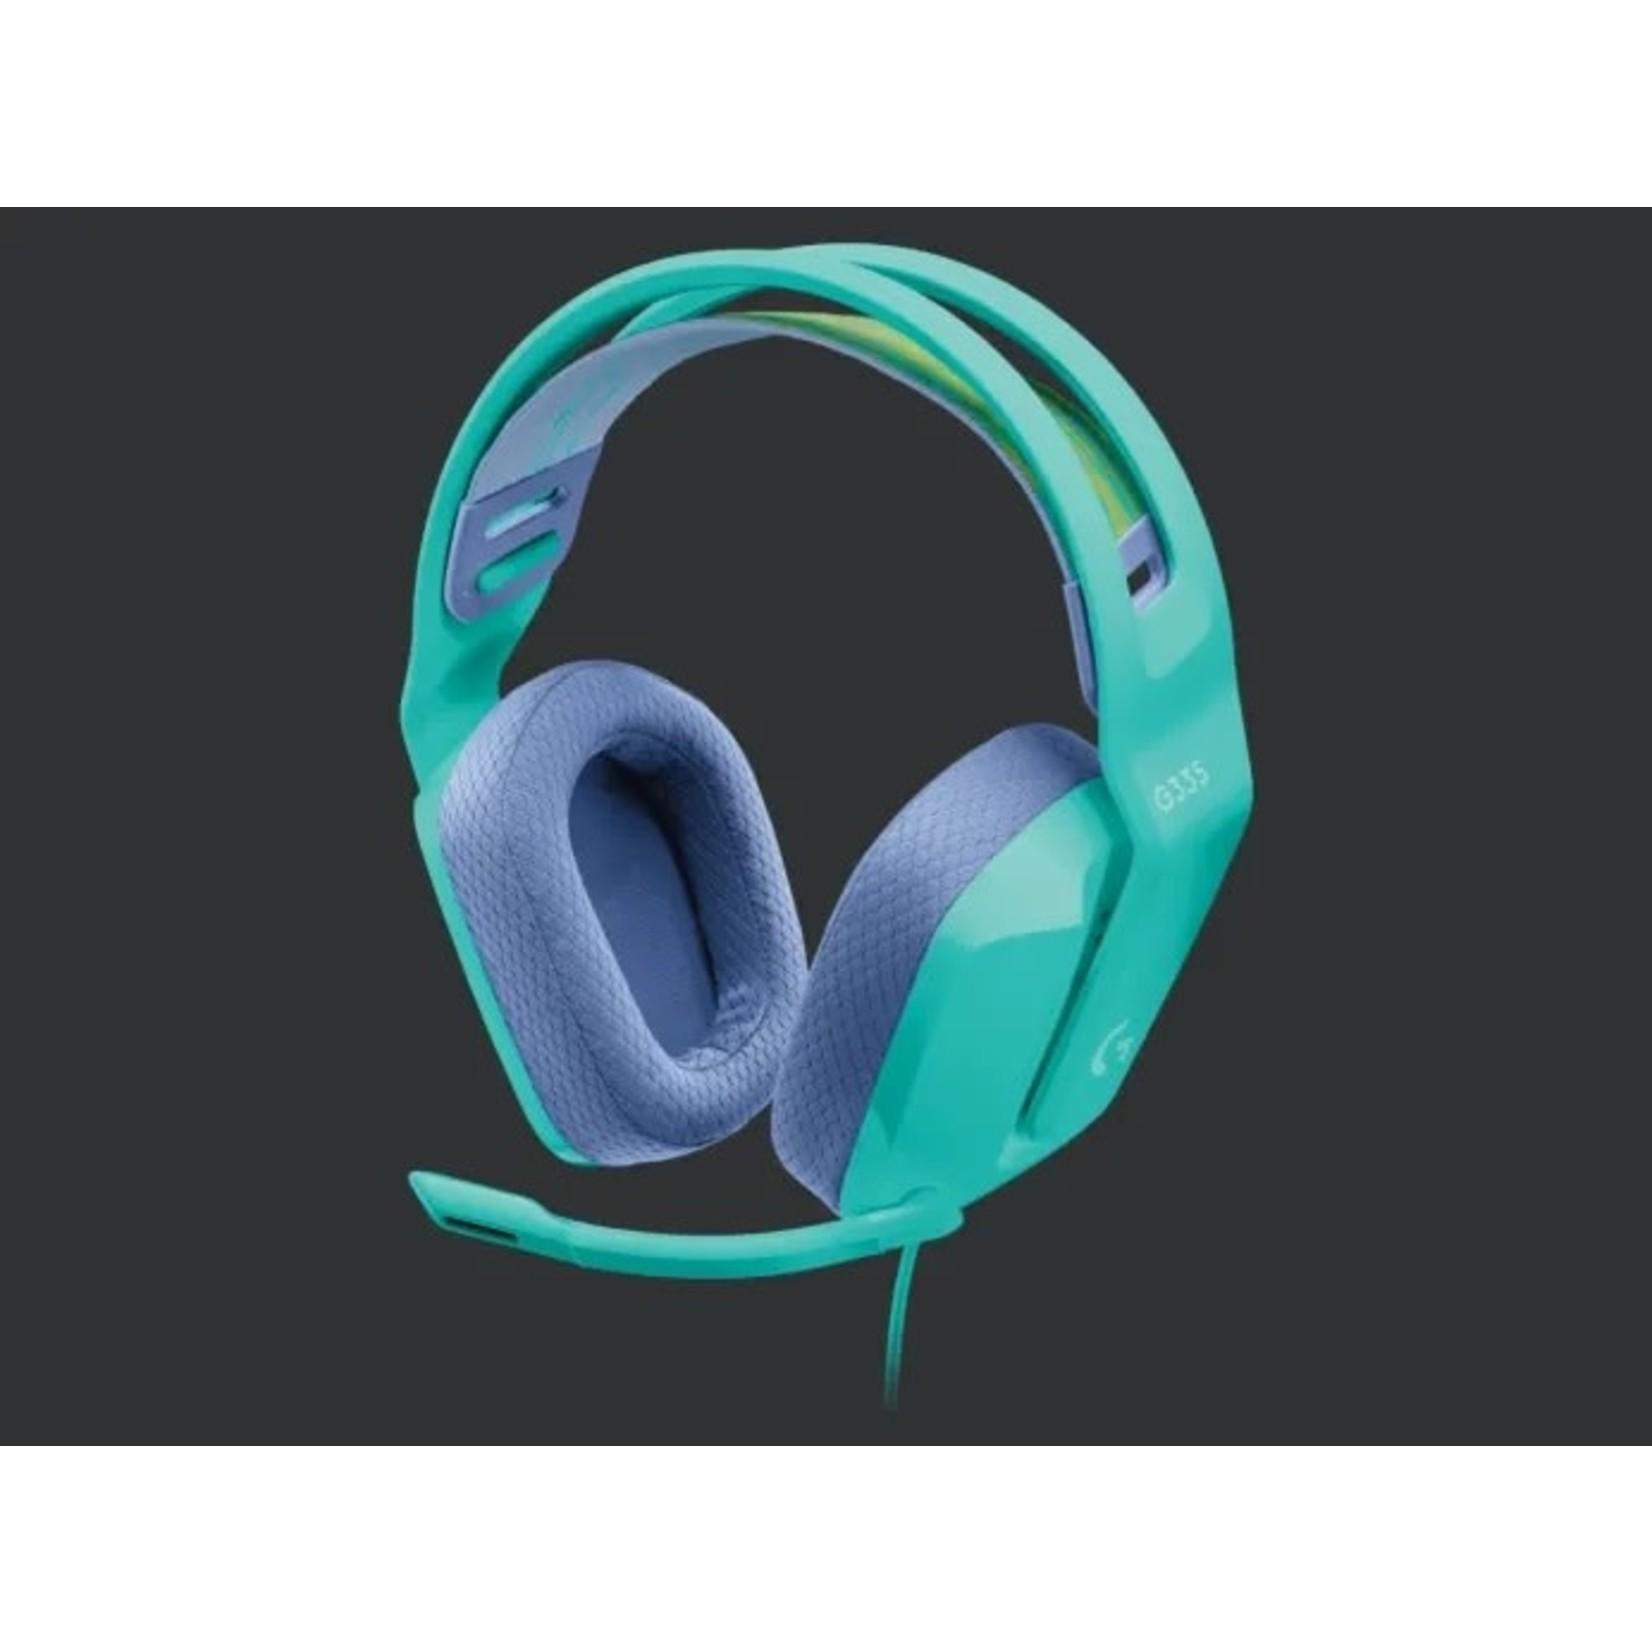 Logitech Logitech G335 Stereo Gaming Headset Mint